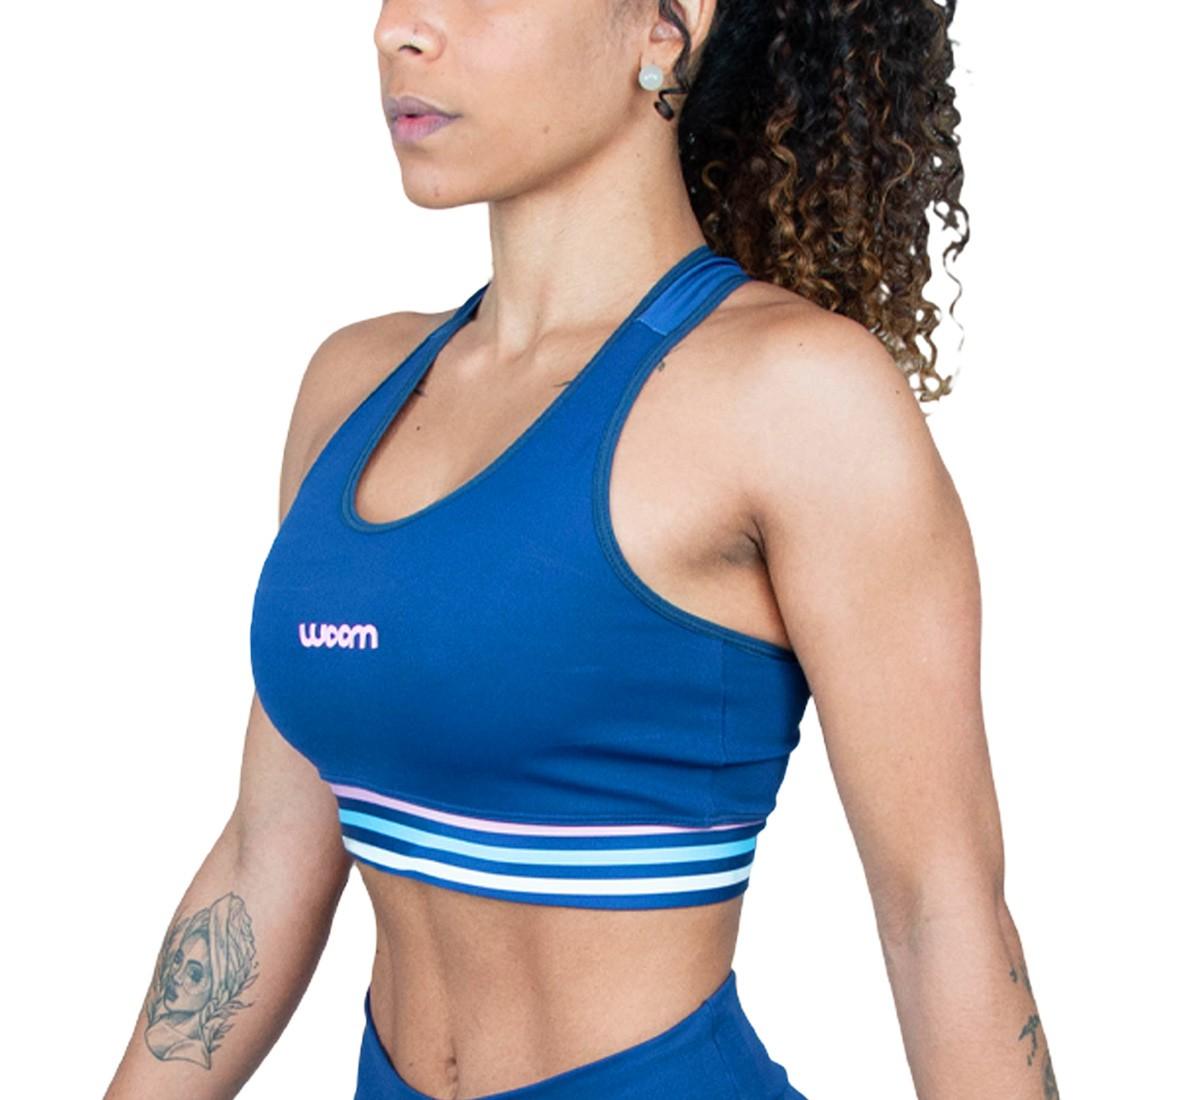 Top Running (Ed Ltda) X-fit Azul Marinho Fem 2021